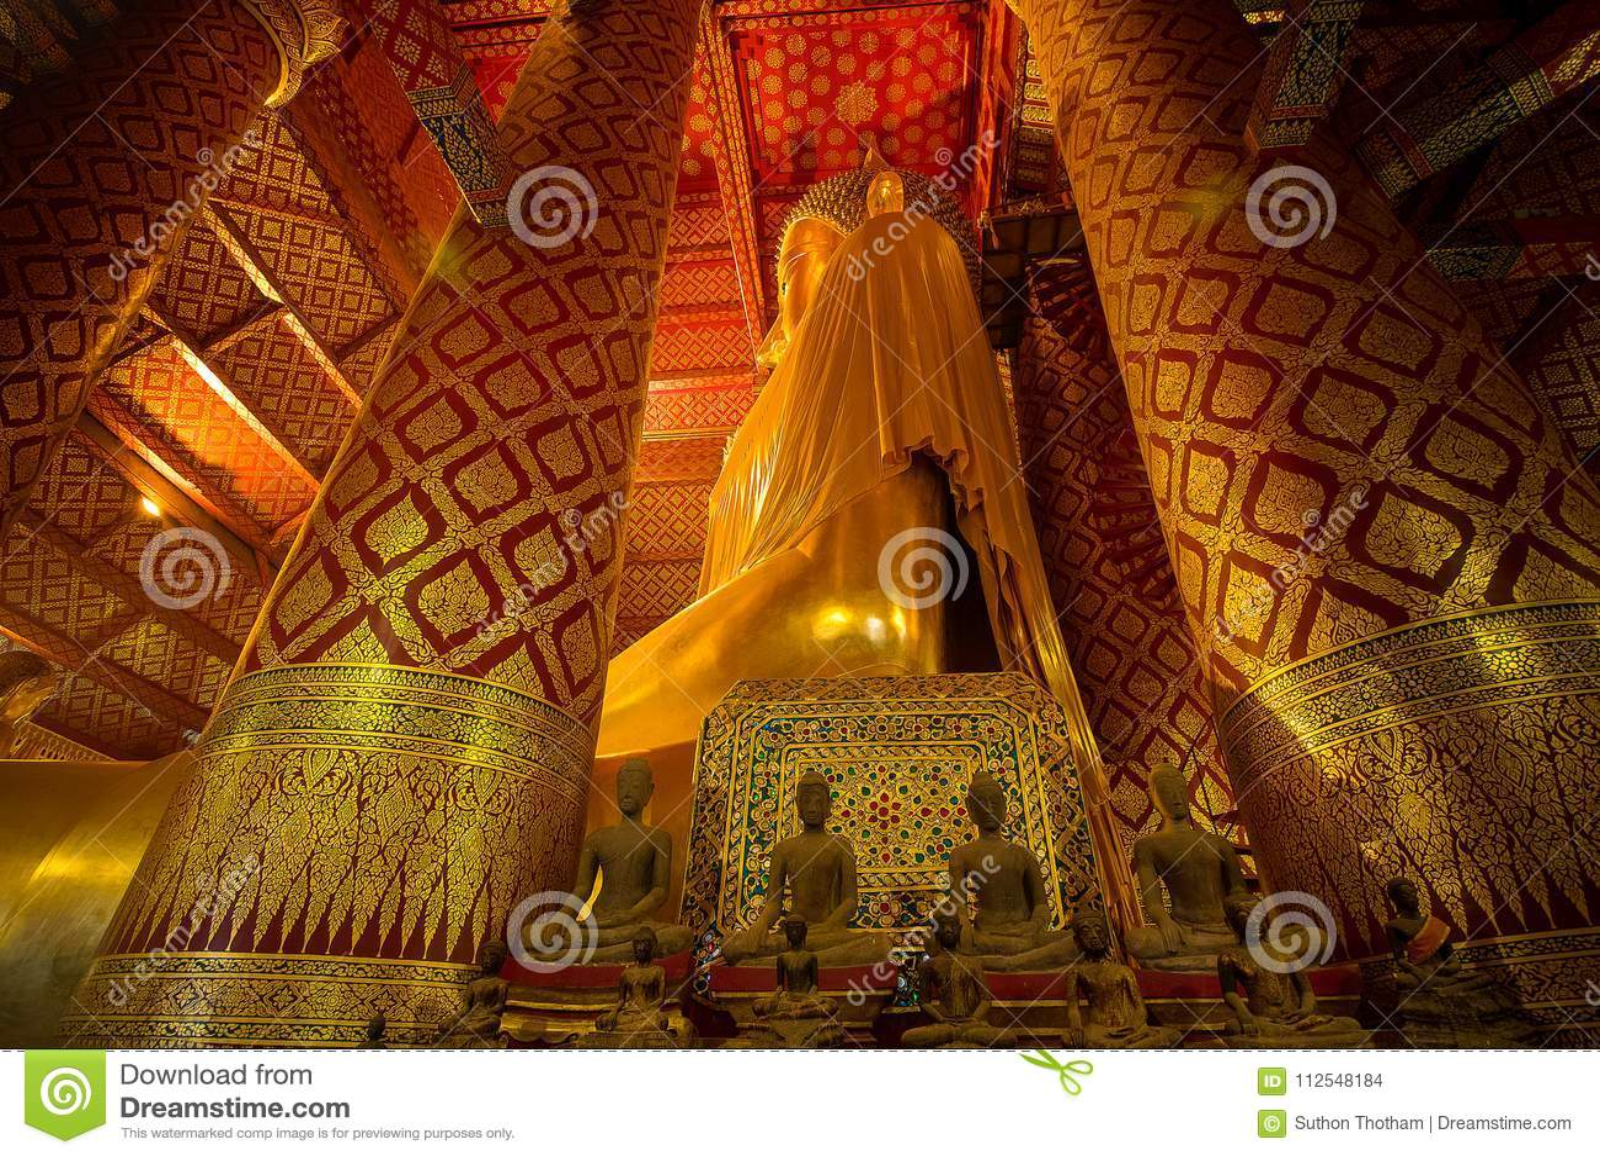 Giant golden Buddha in Wat Phanan Choeng Temple in Ayutthaya, Th